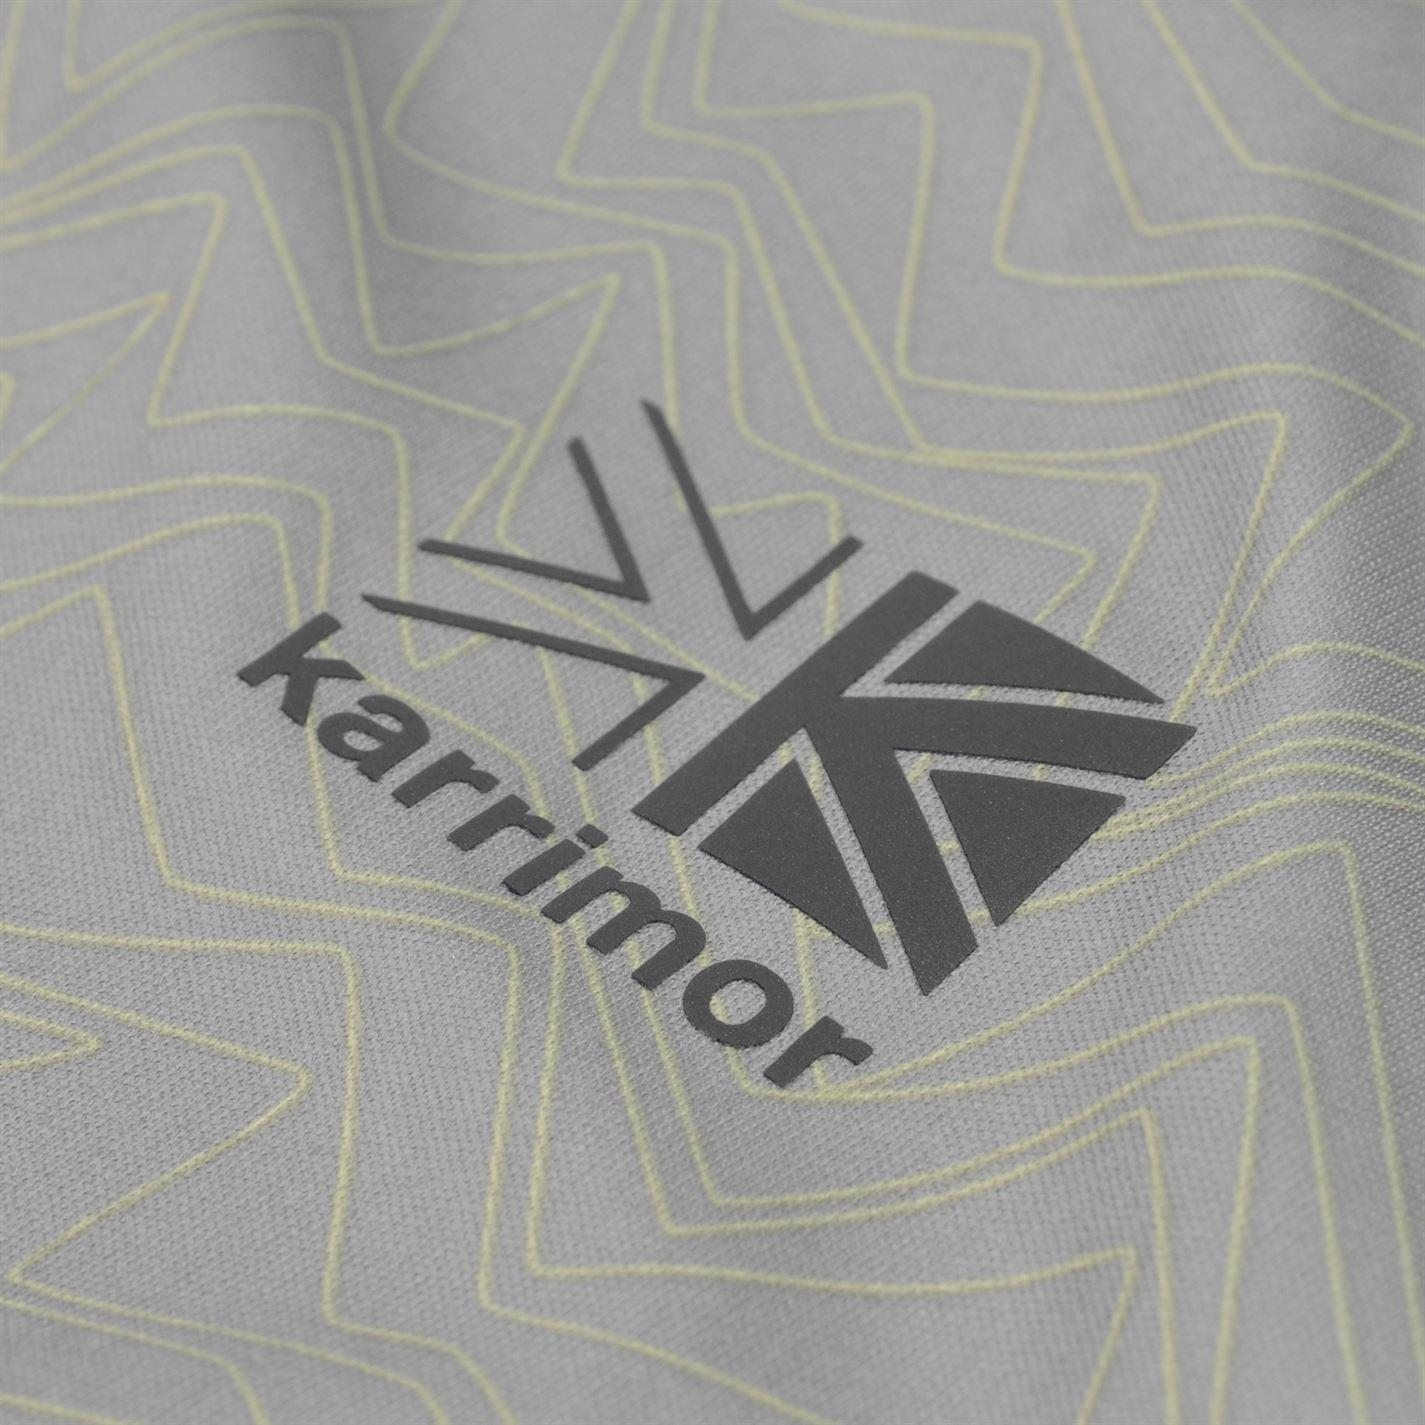 Karrimor-Hombres-X-Lite-Camiseta-mangas-cortas-de-carrera-Rendimiento-Camiseta-Top-Cuello-Redondo miniatura 9